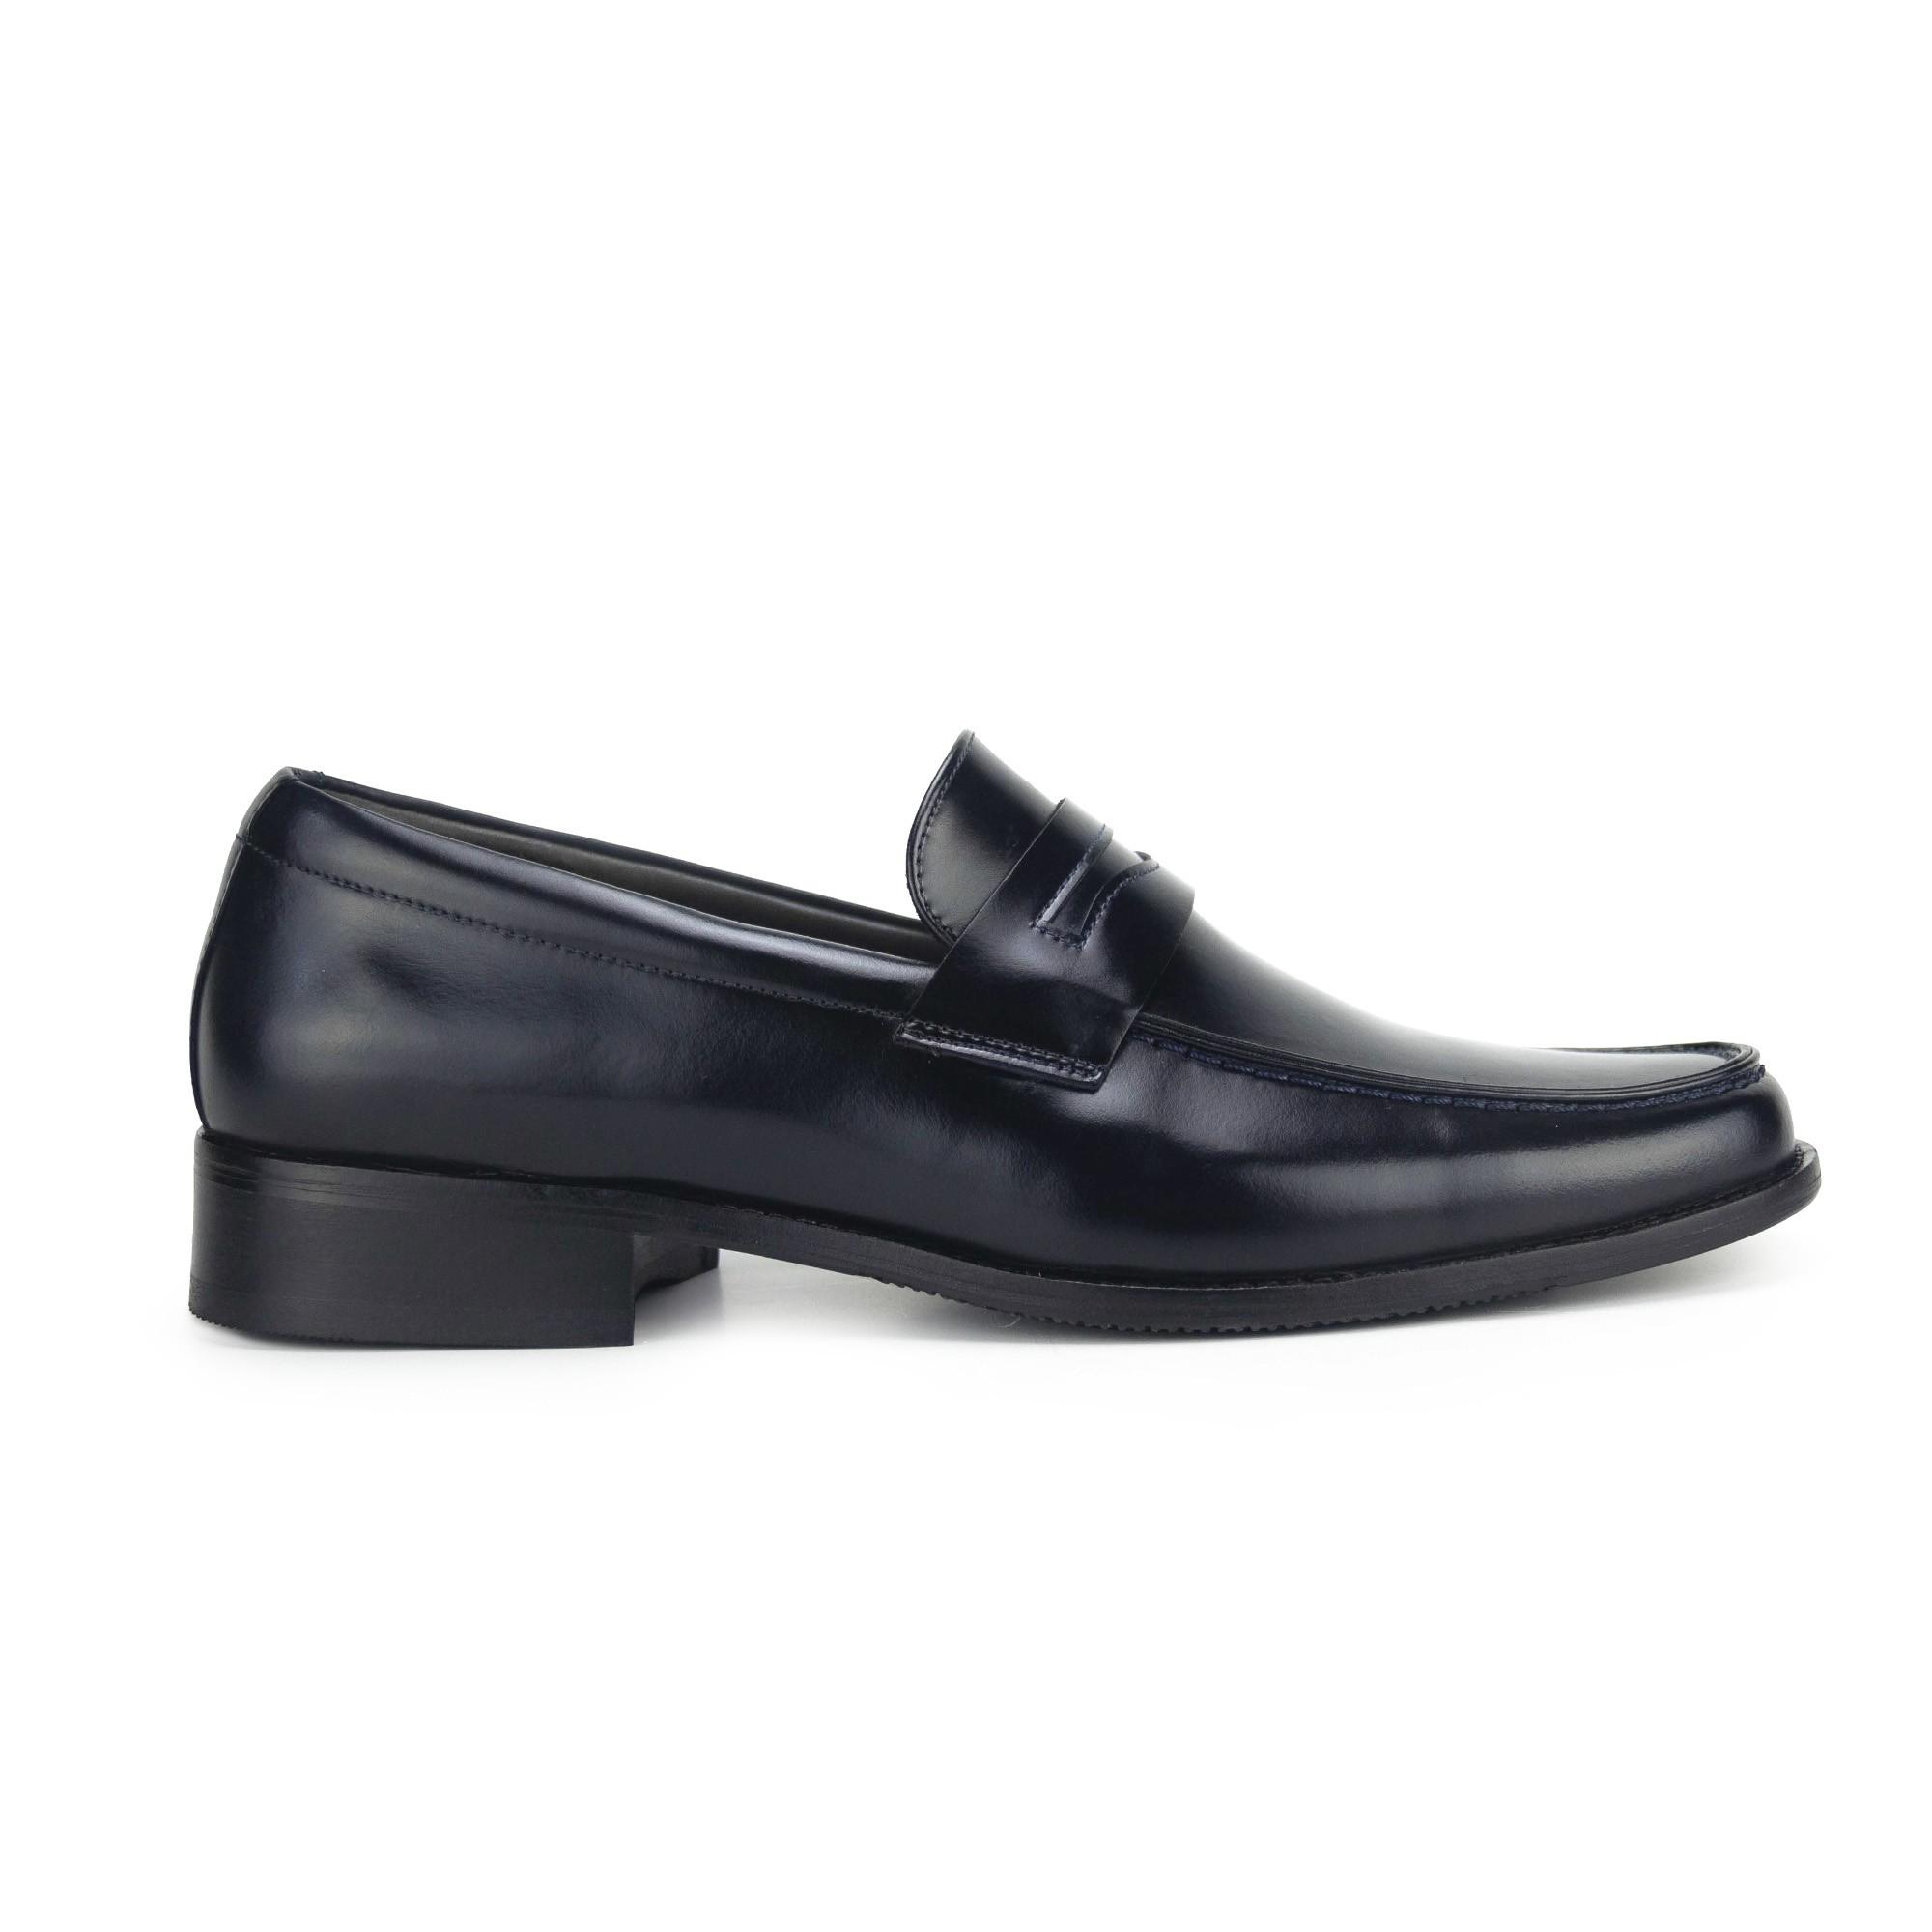 Sapato Loafer Masculino Marinho Monbran Dressy